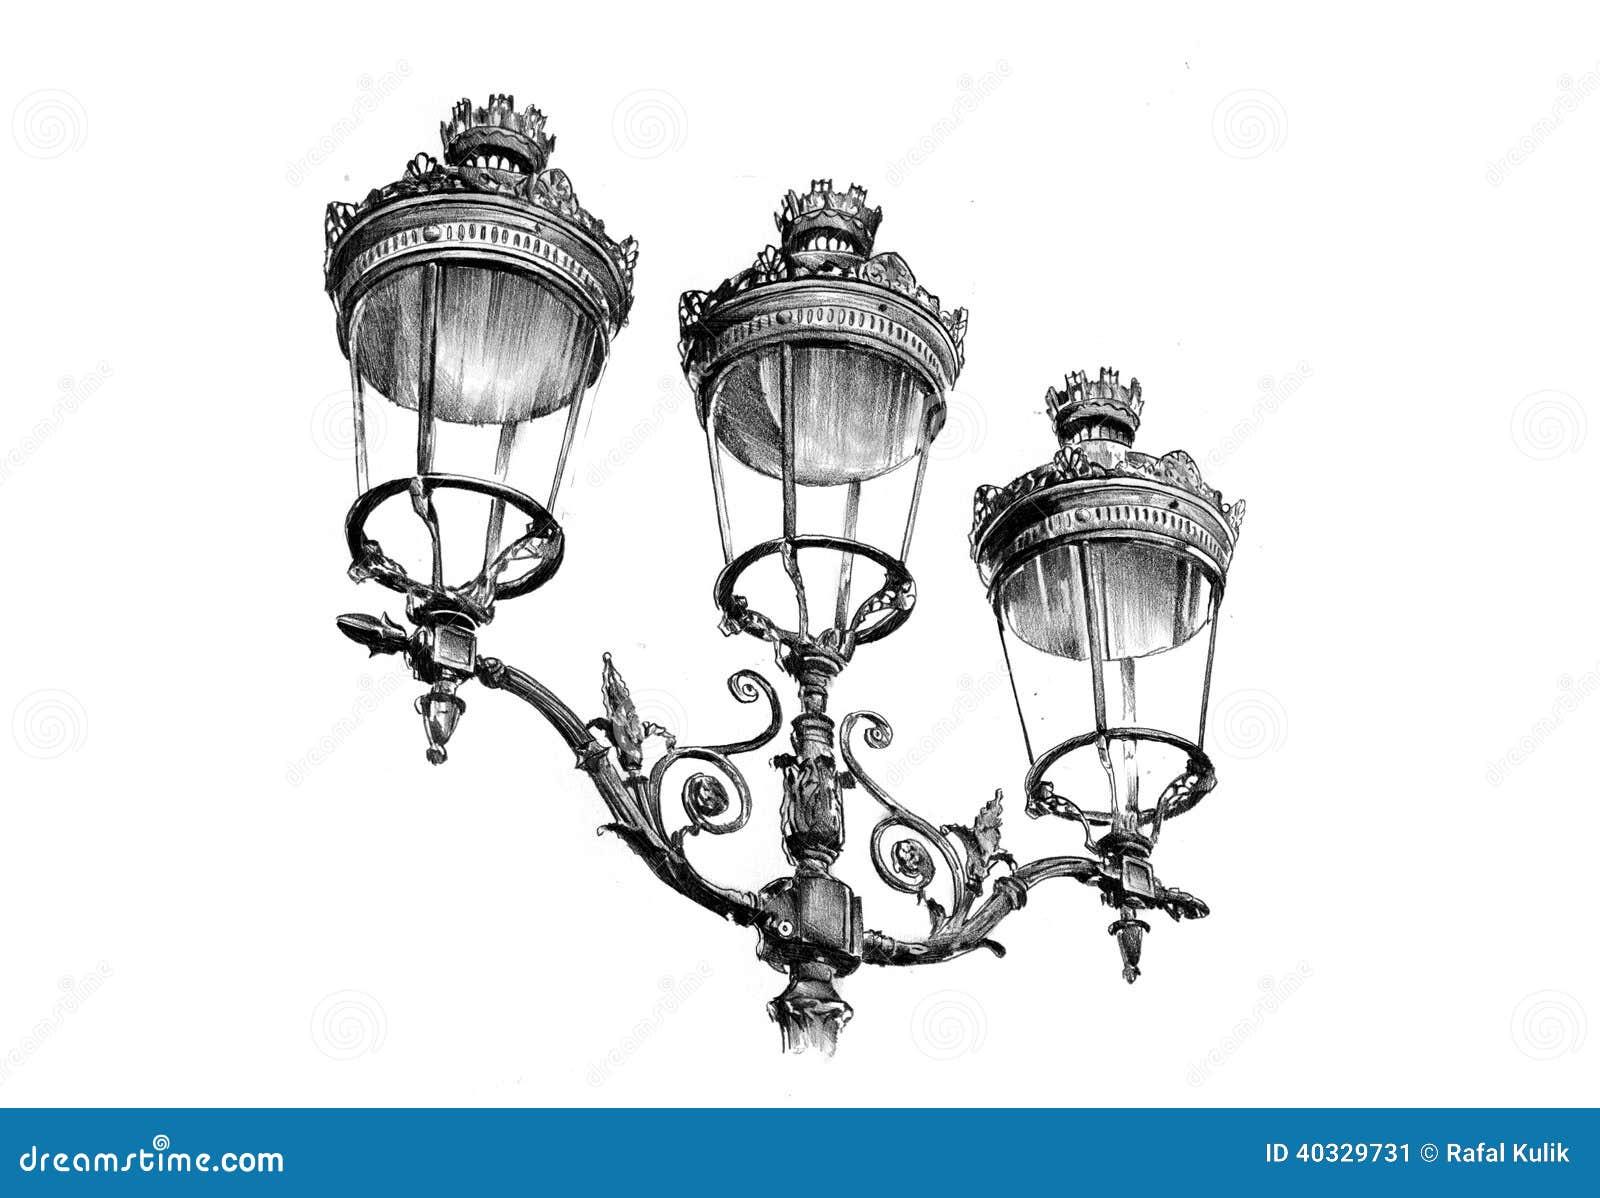 Antique Street Lantern Drawing Handmade Stock Illustration